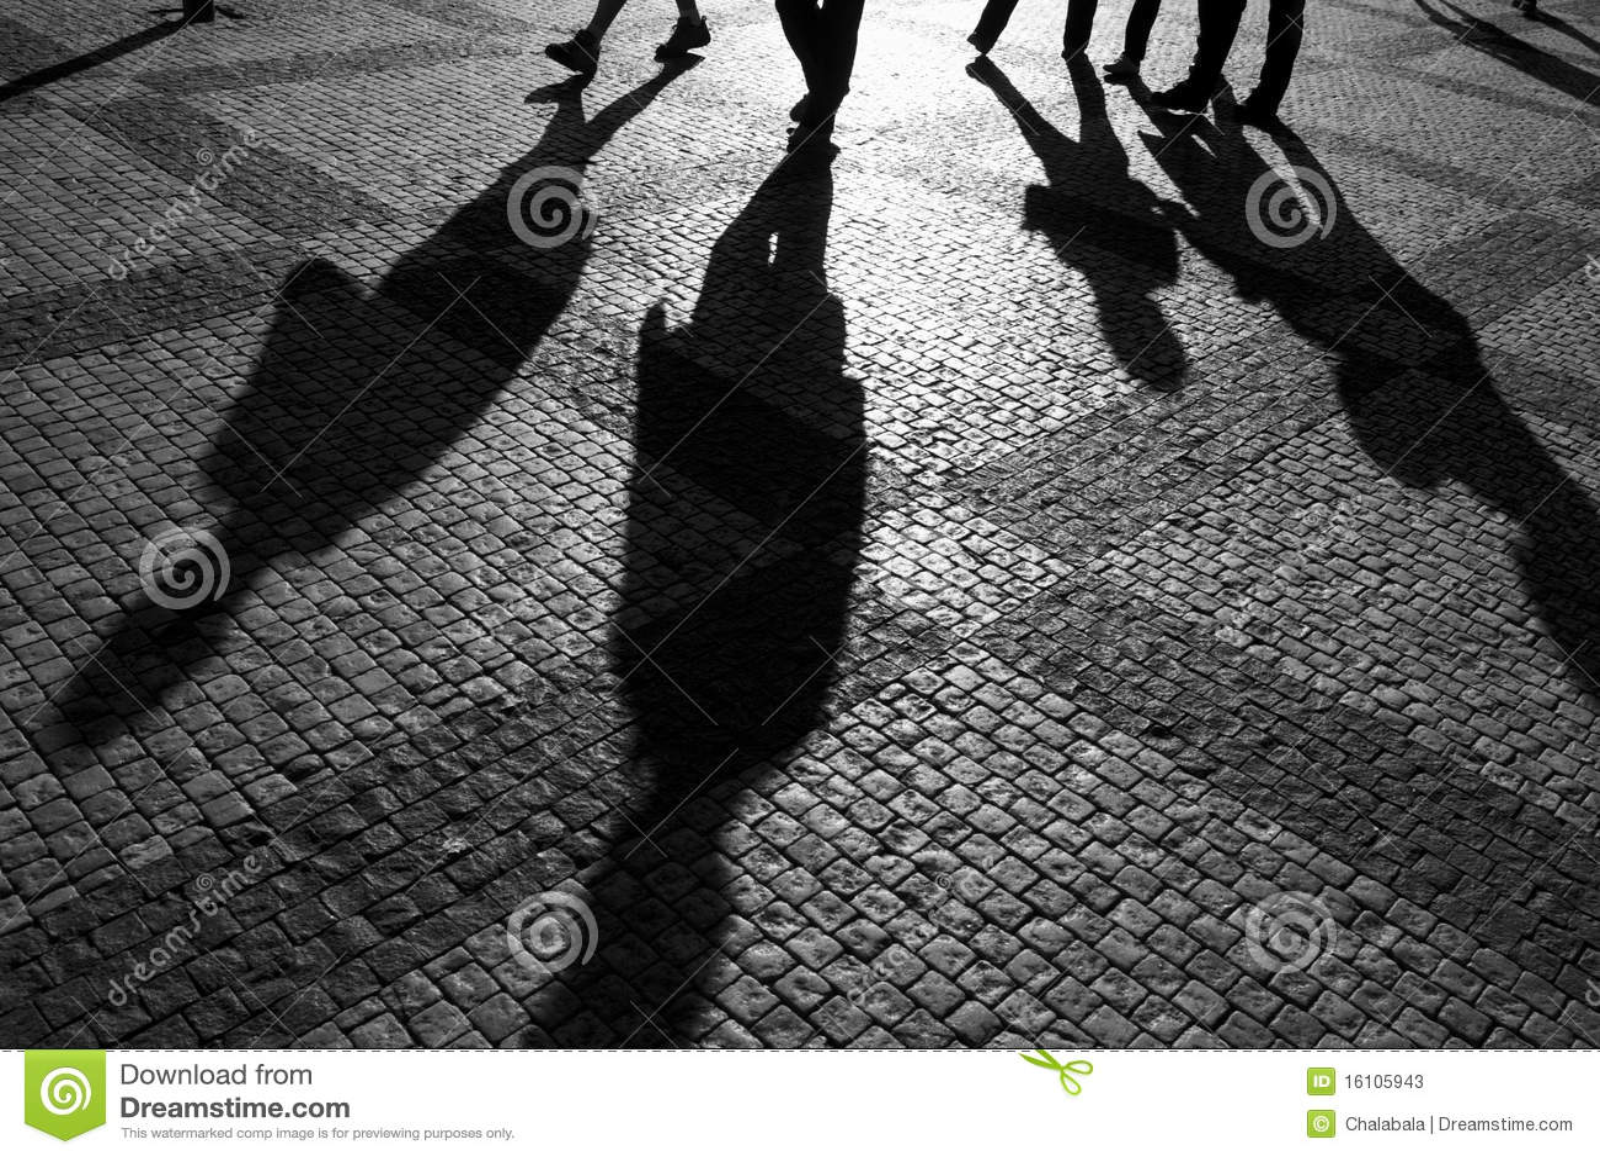 Shadows of people